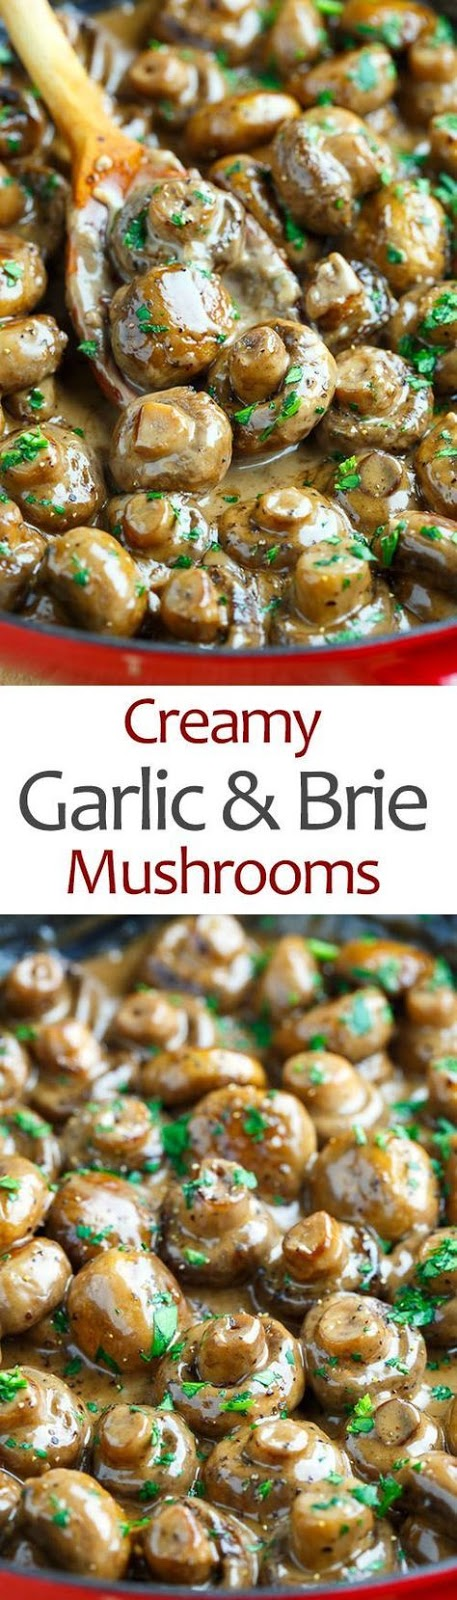 Creamy Garlic and Brie Mushrooms Recipes